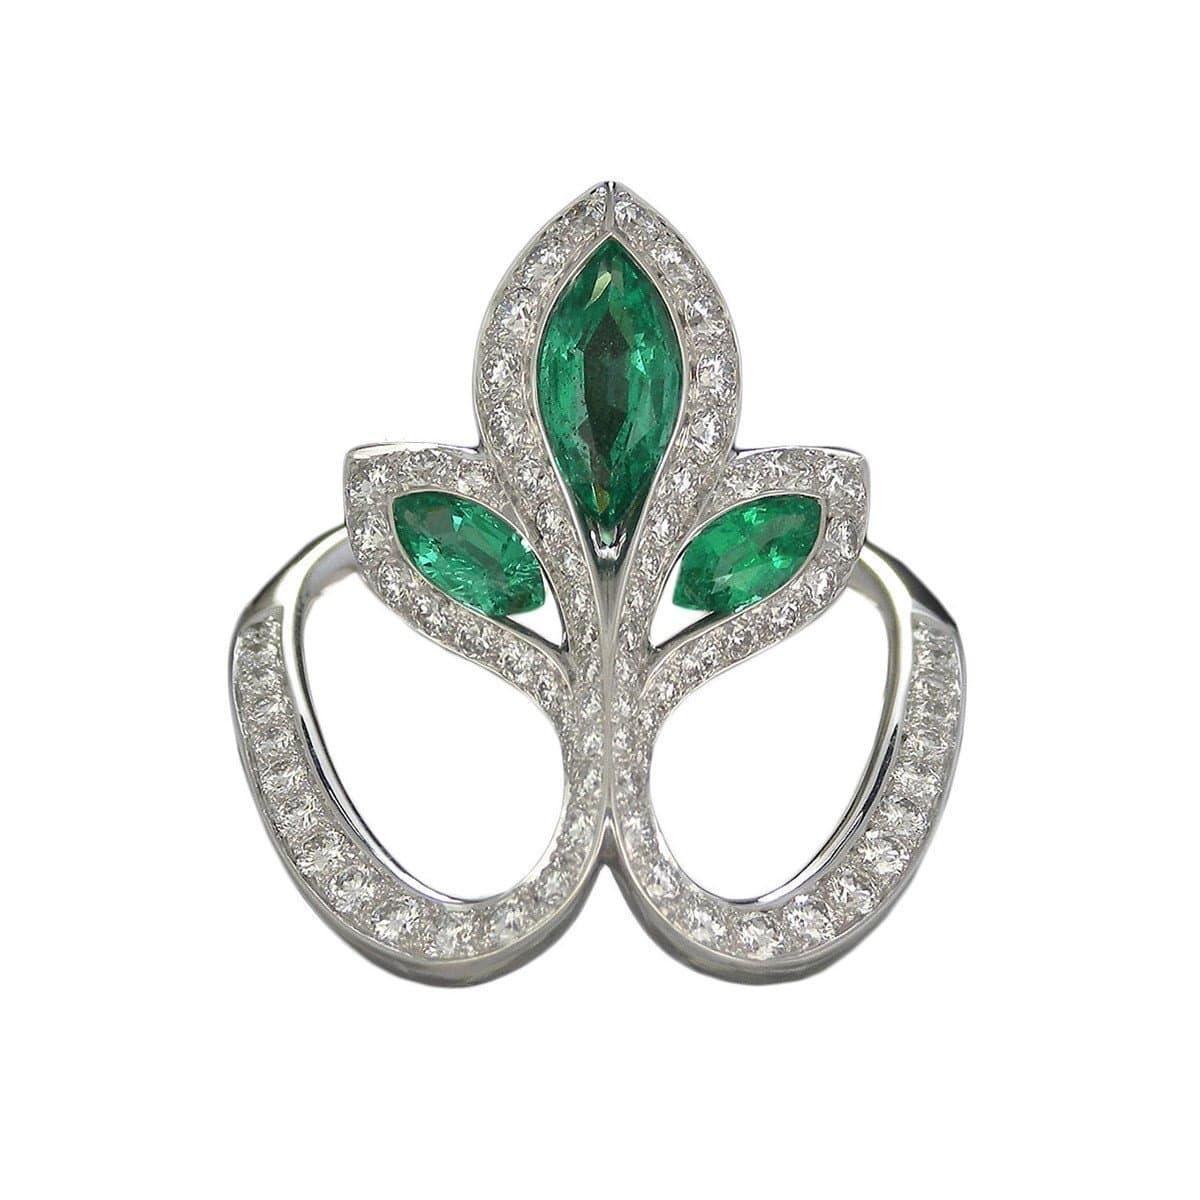 White Gold, Emerald & Diamond Royale Lys Ring | Baenteli